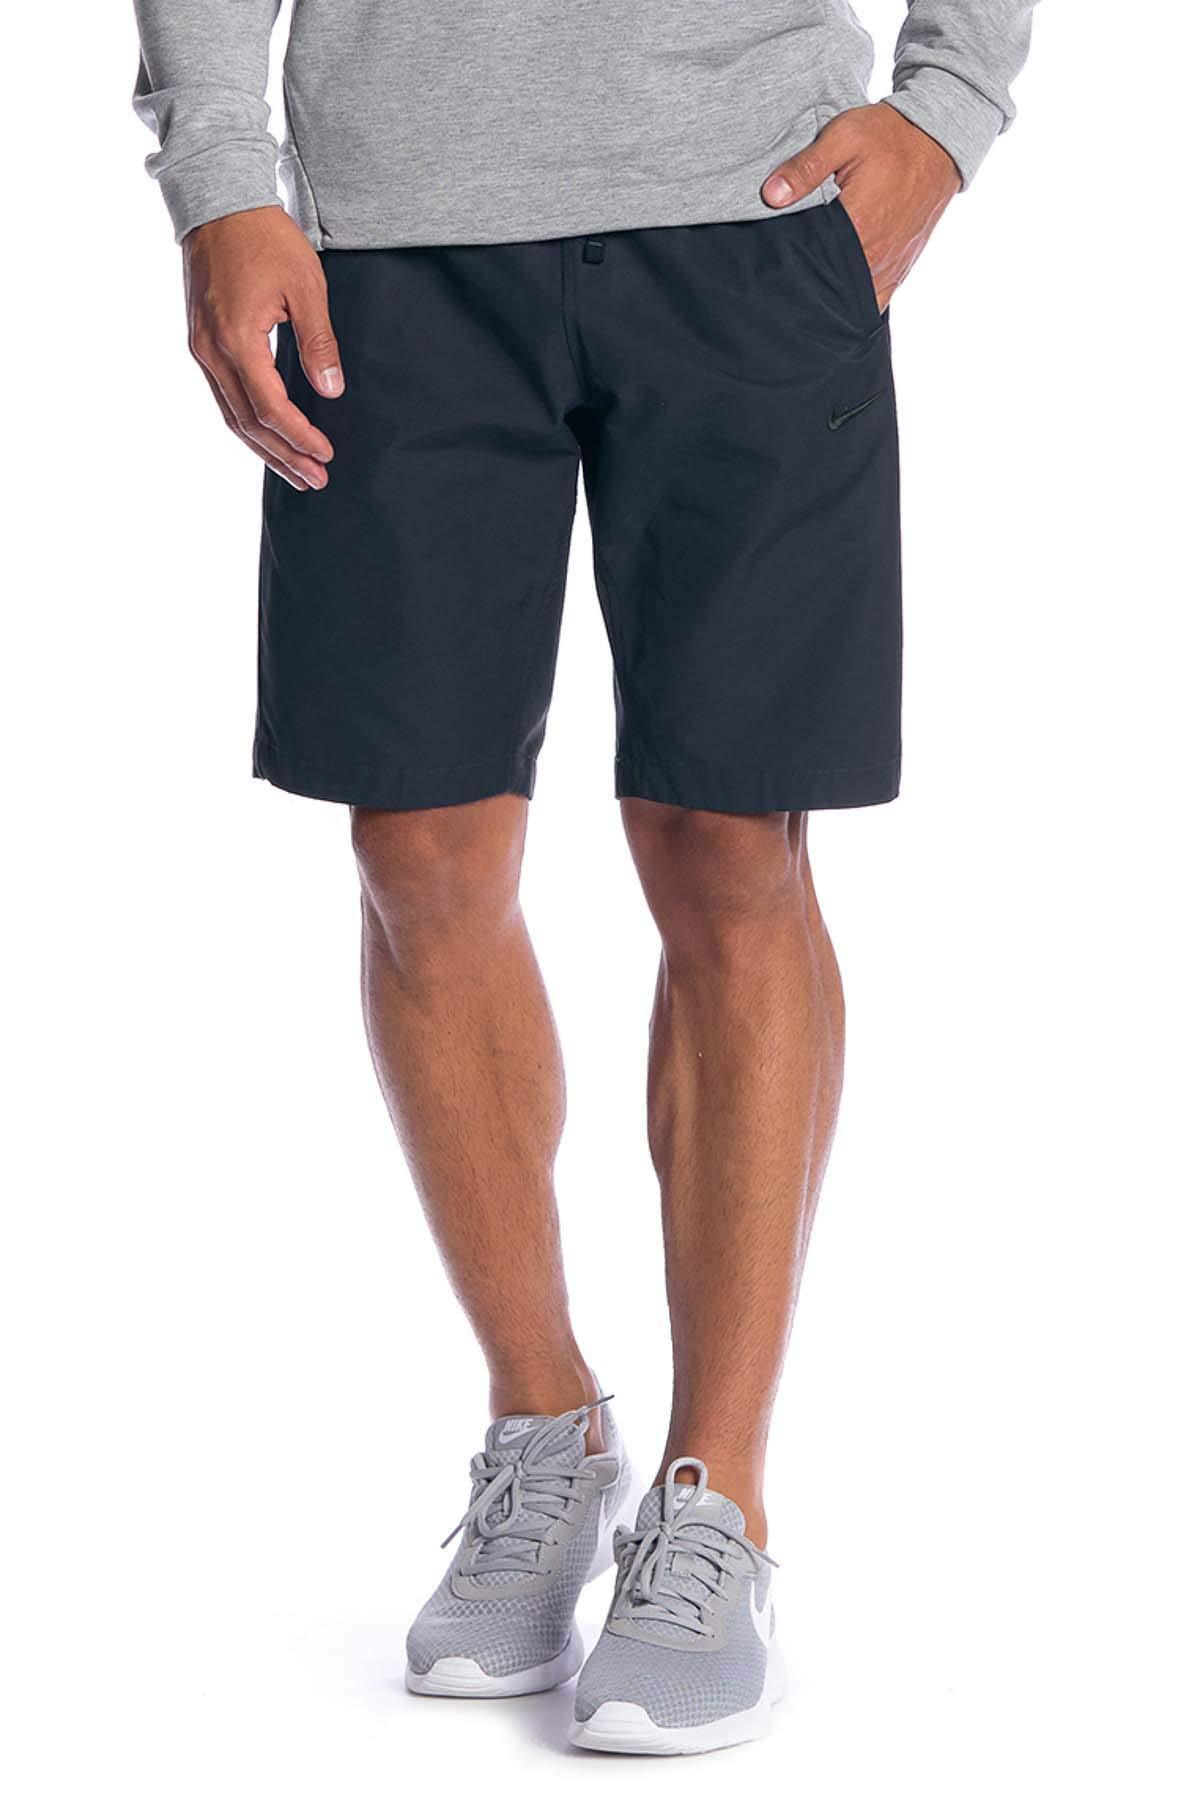 Nike Men's Sportswear Woven Players Shorts-Navy-Small by Nike